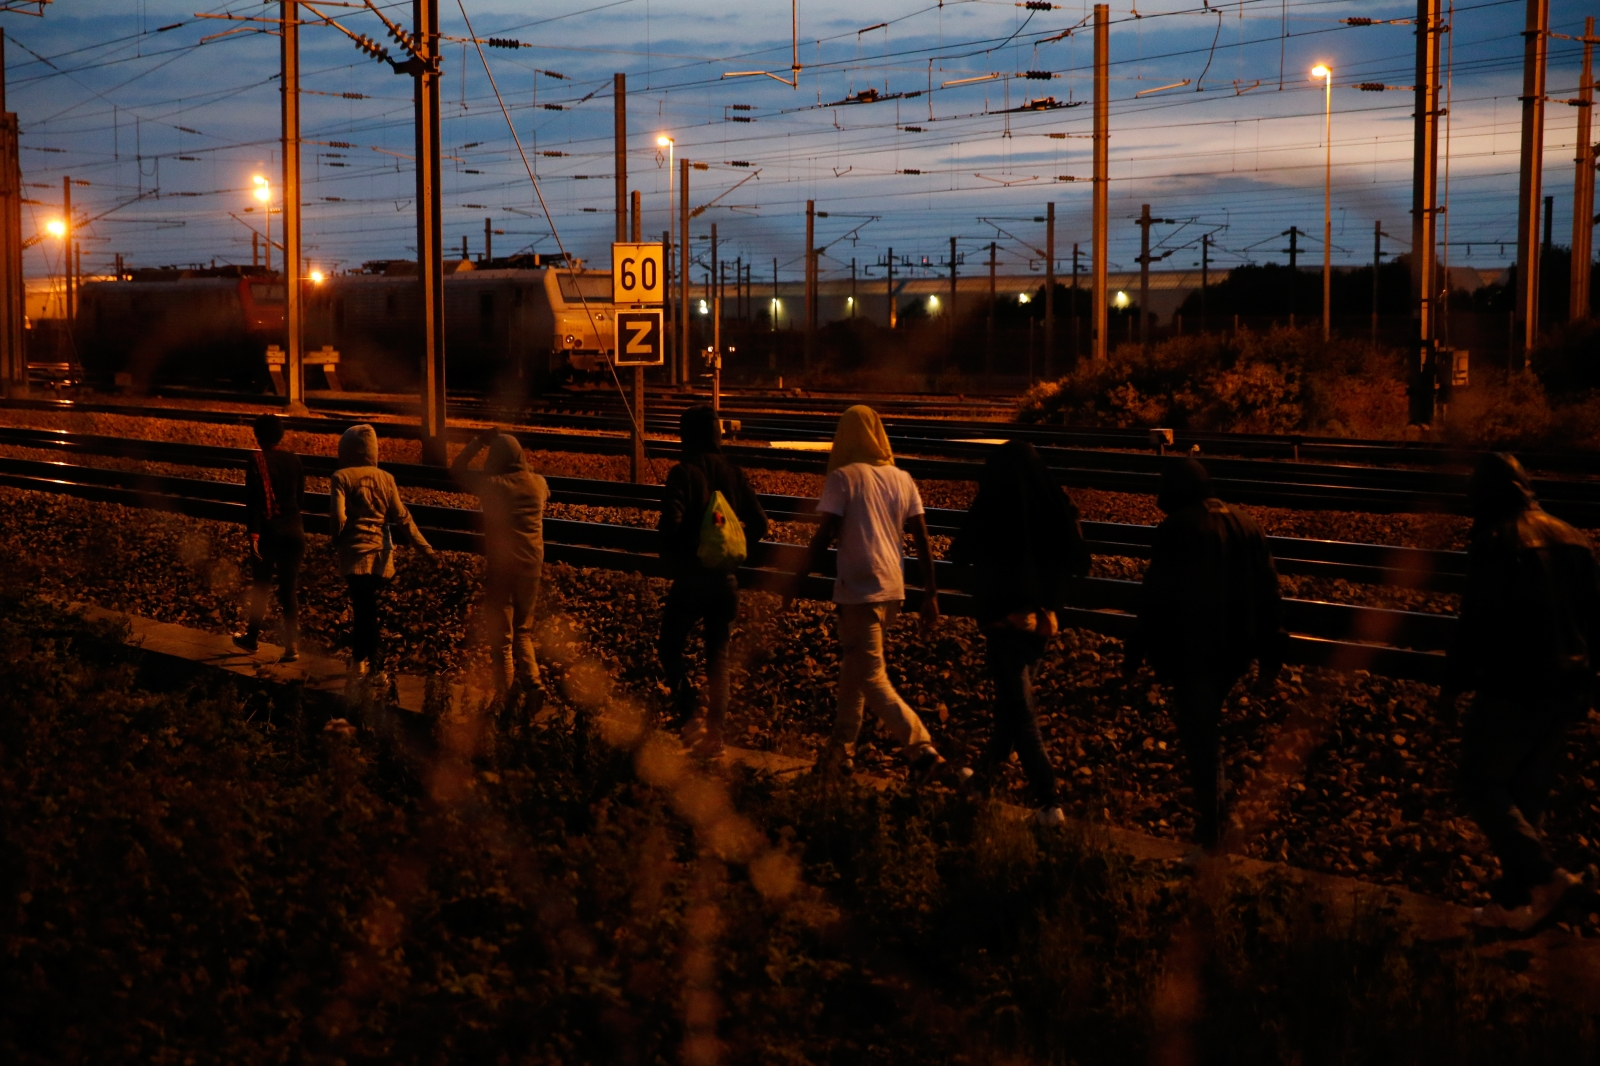 Migrants walk along the tracks